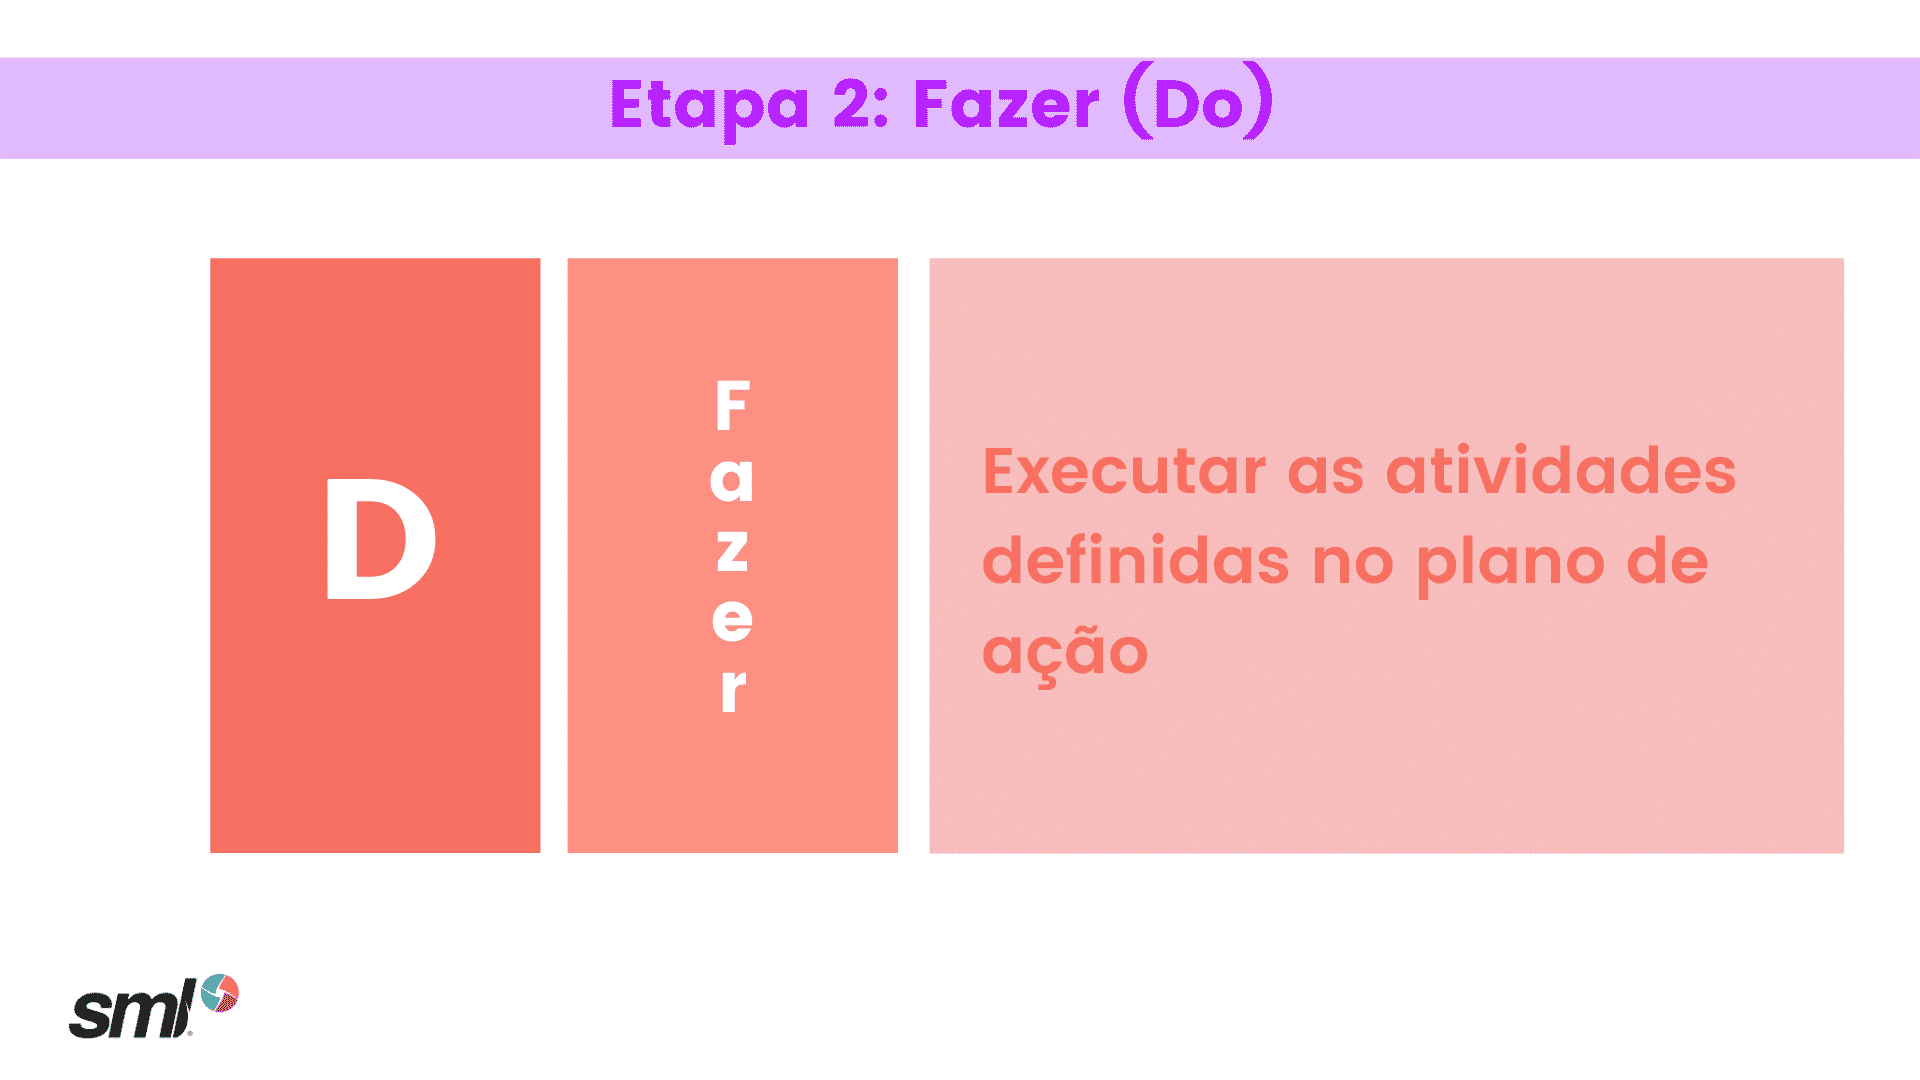 Etapa 2: Fazer